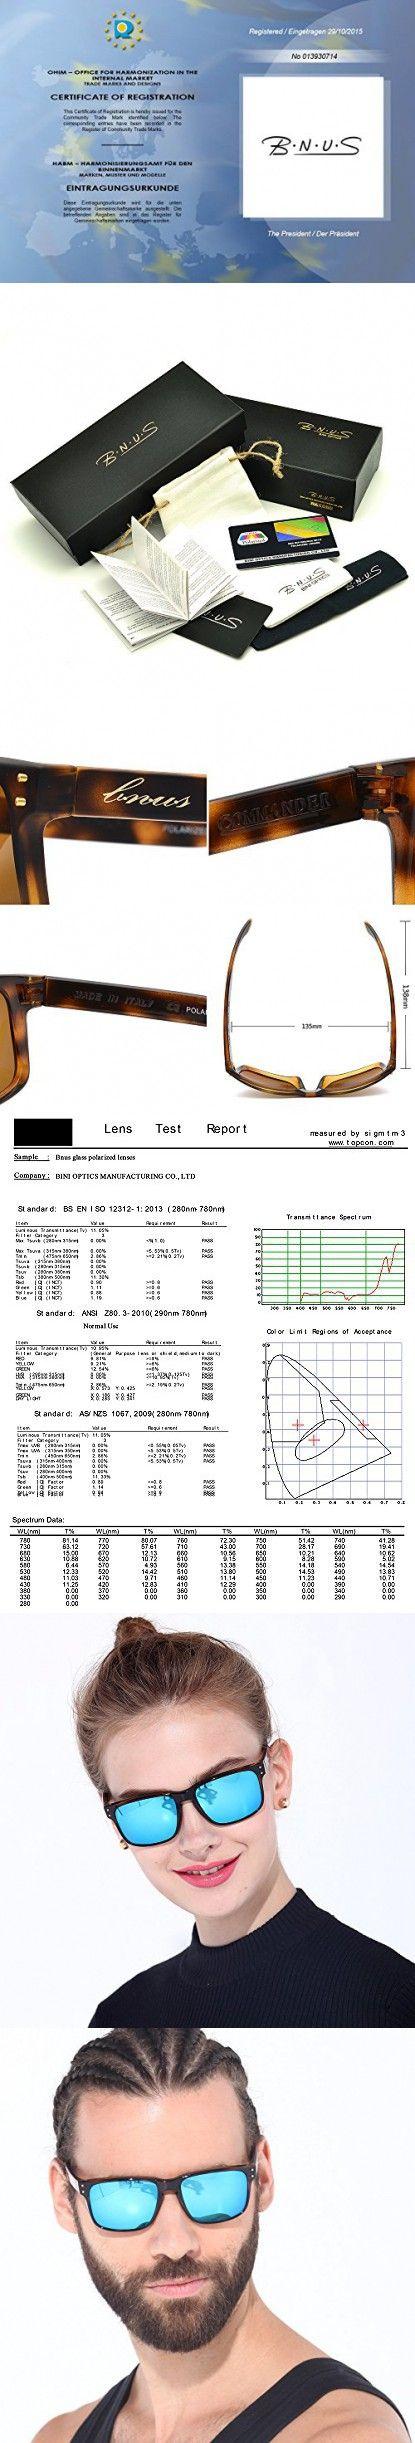 fccbfcac64d BNUS Italy made Classic Sunglasses Corning Real Glass Lens w. Polarized  Option (Frame  Tortoise   Lens  Blue Flash